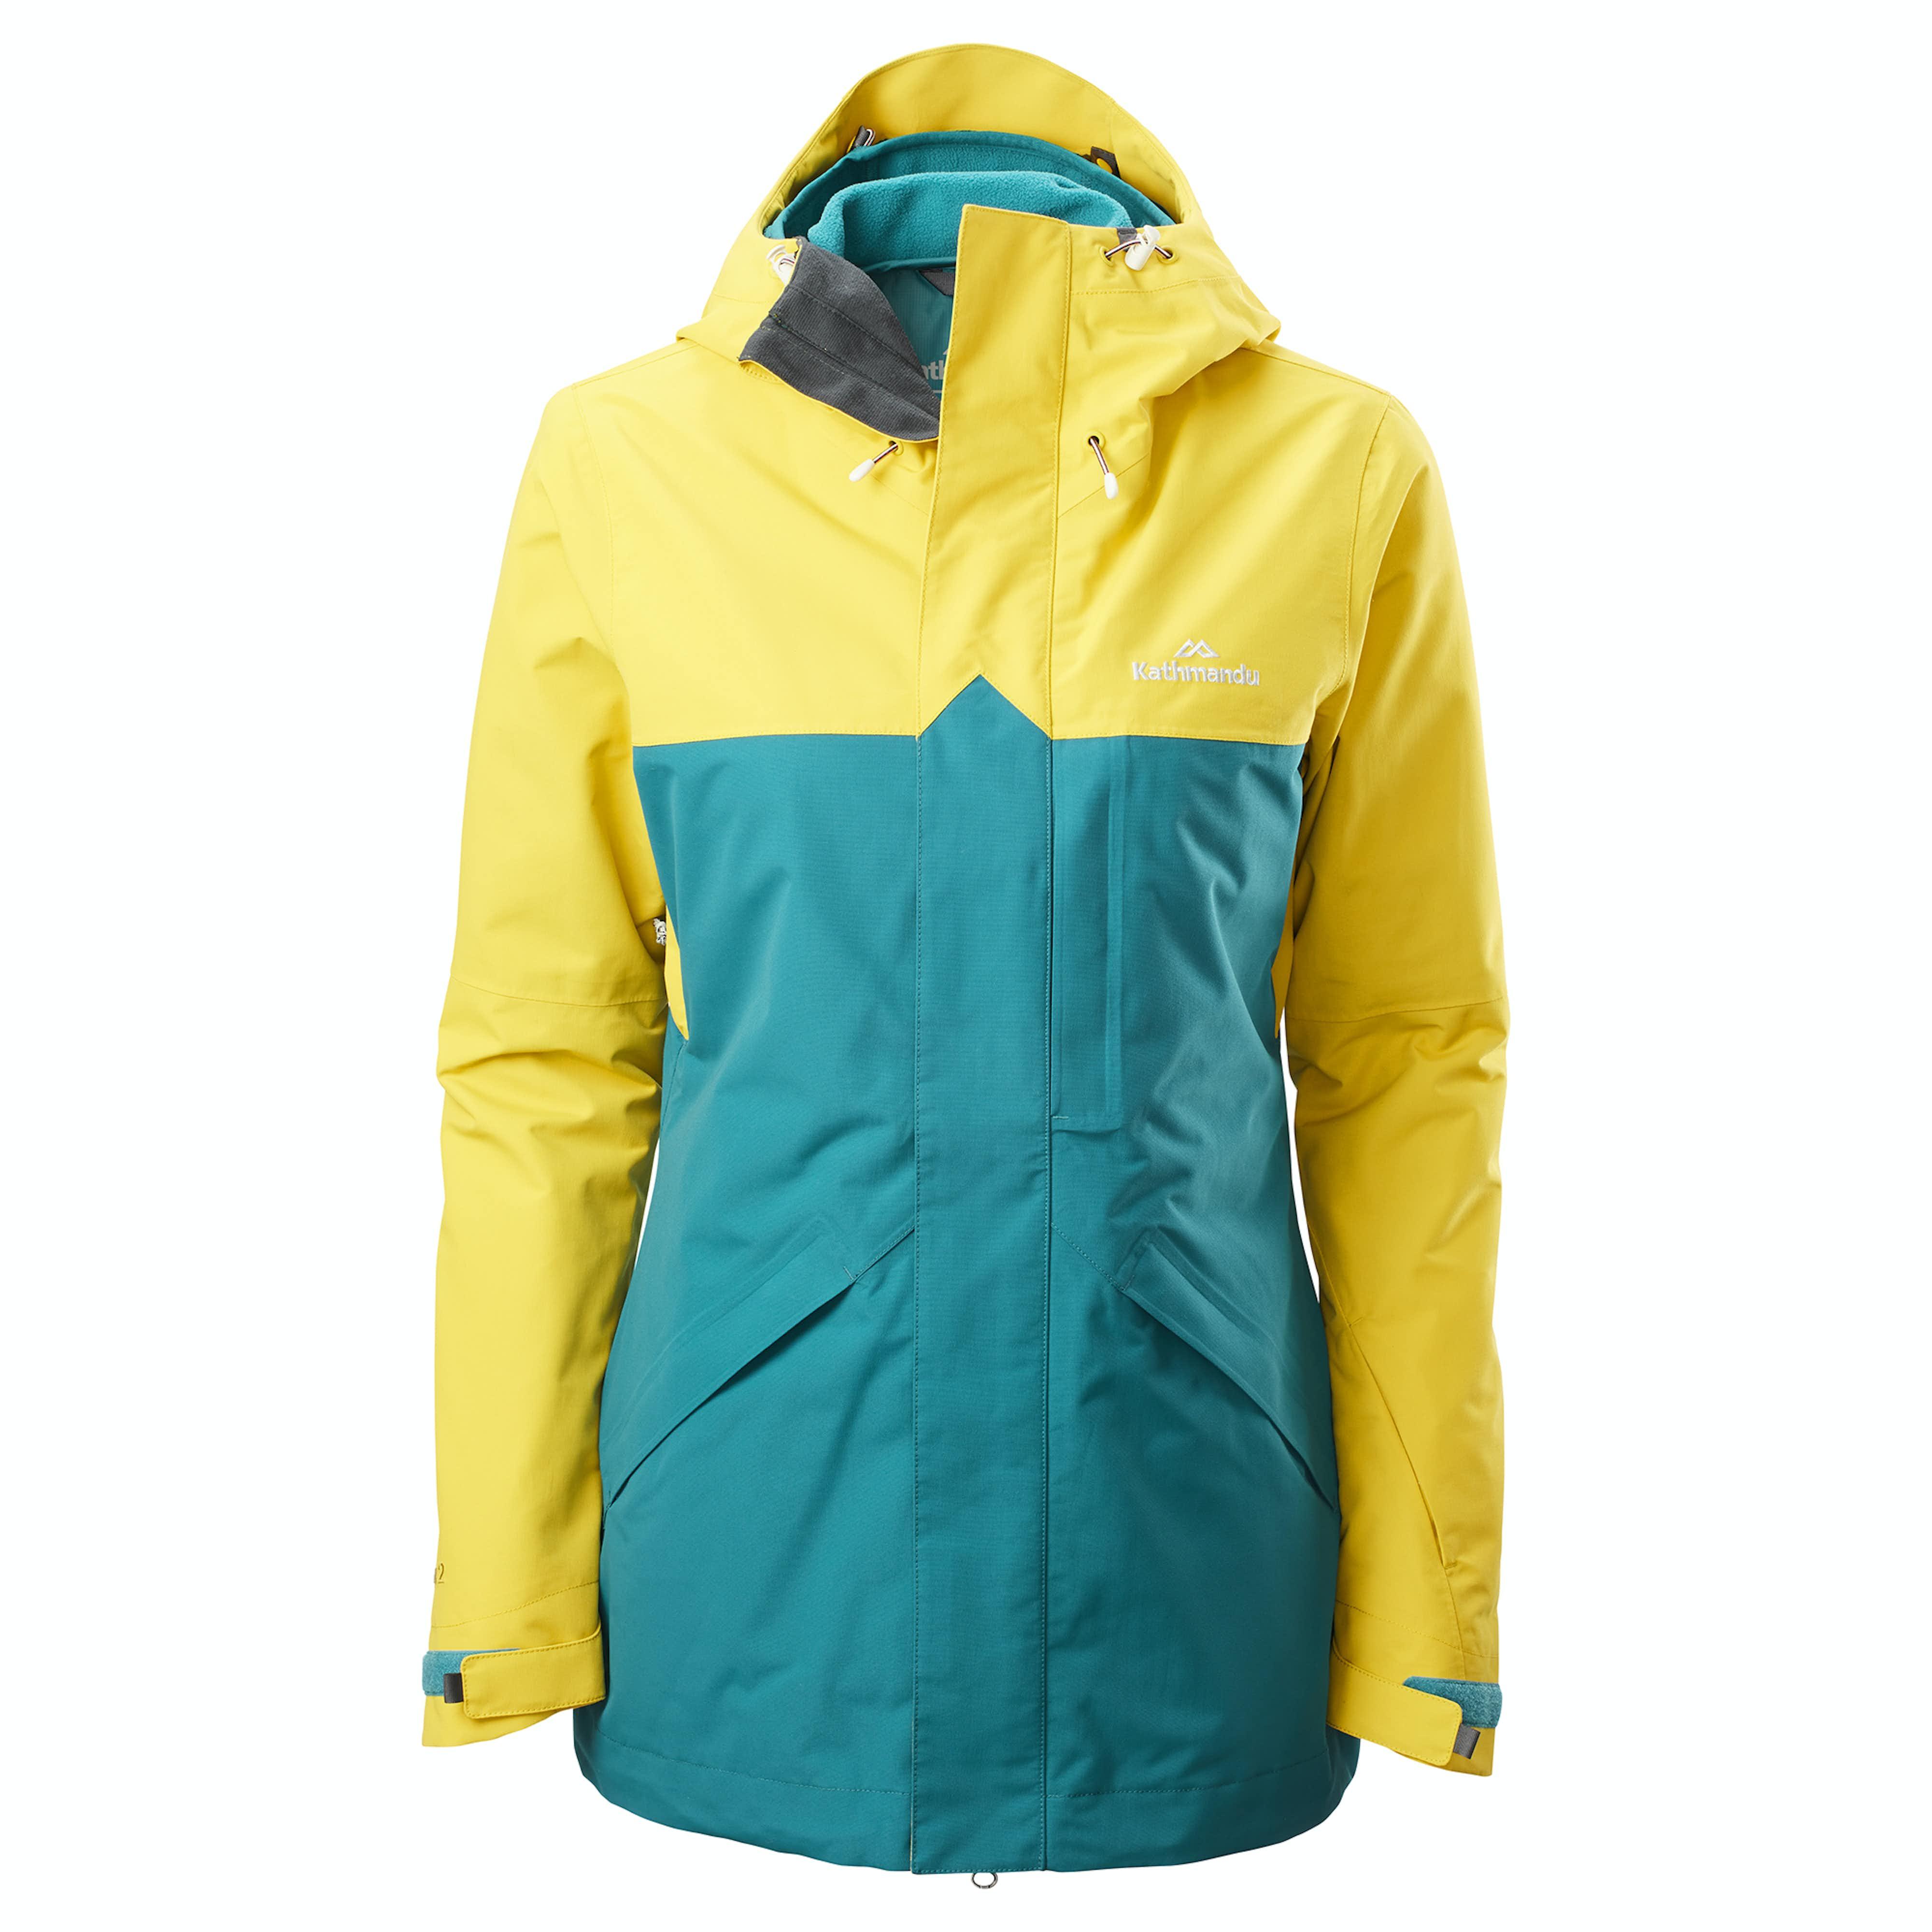 a430f8c4c Womens Jackets & Coats | Winter Coats for Women | Kathmandu AU